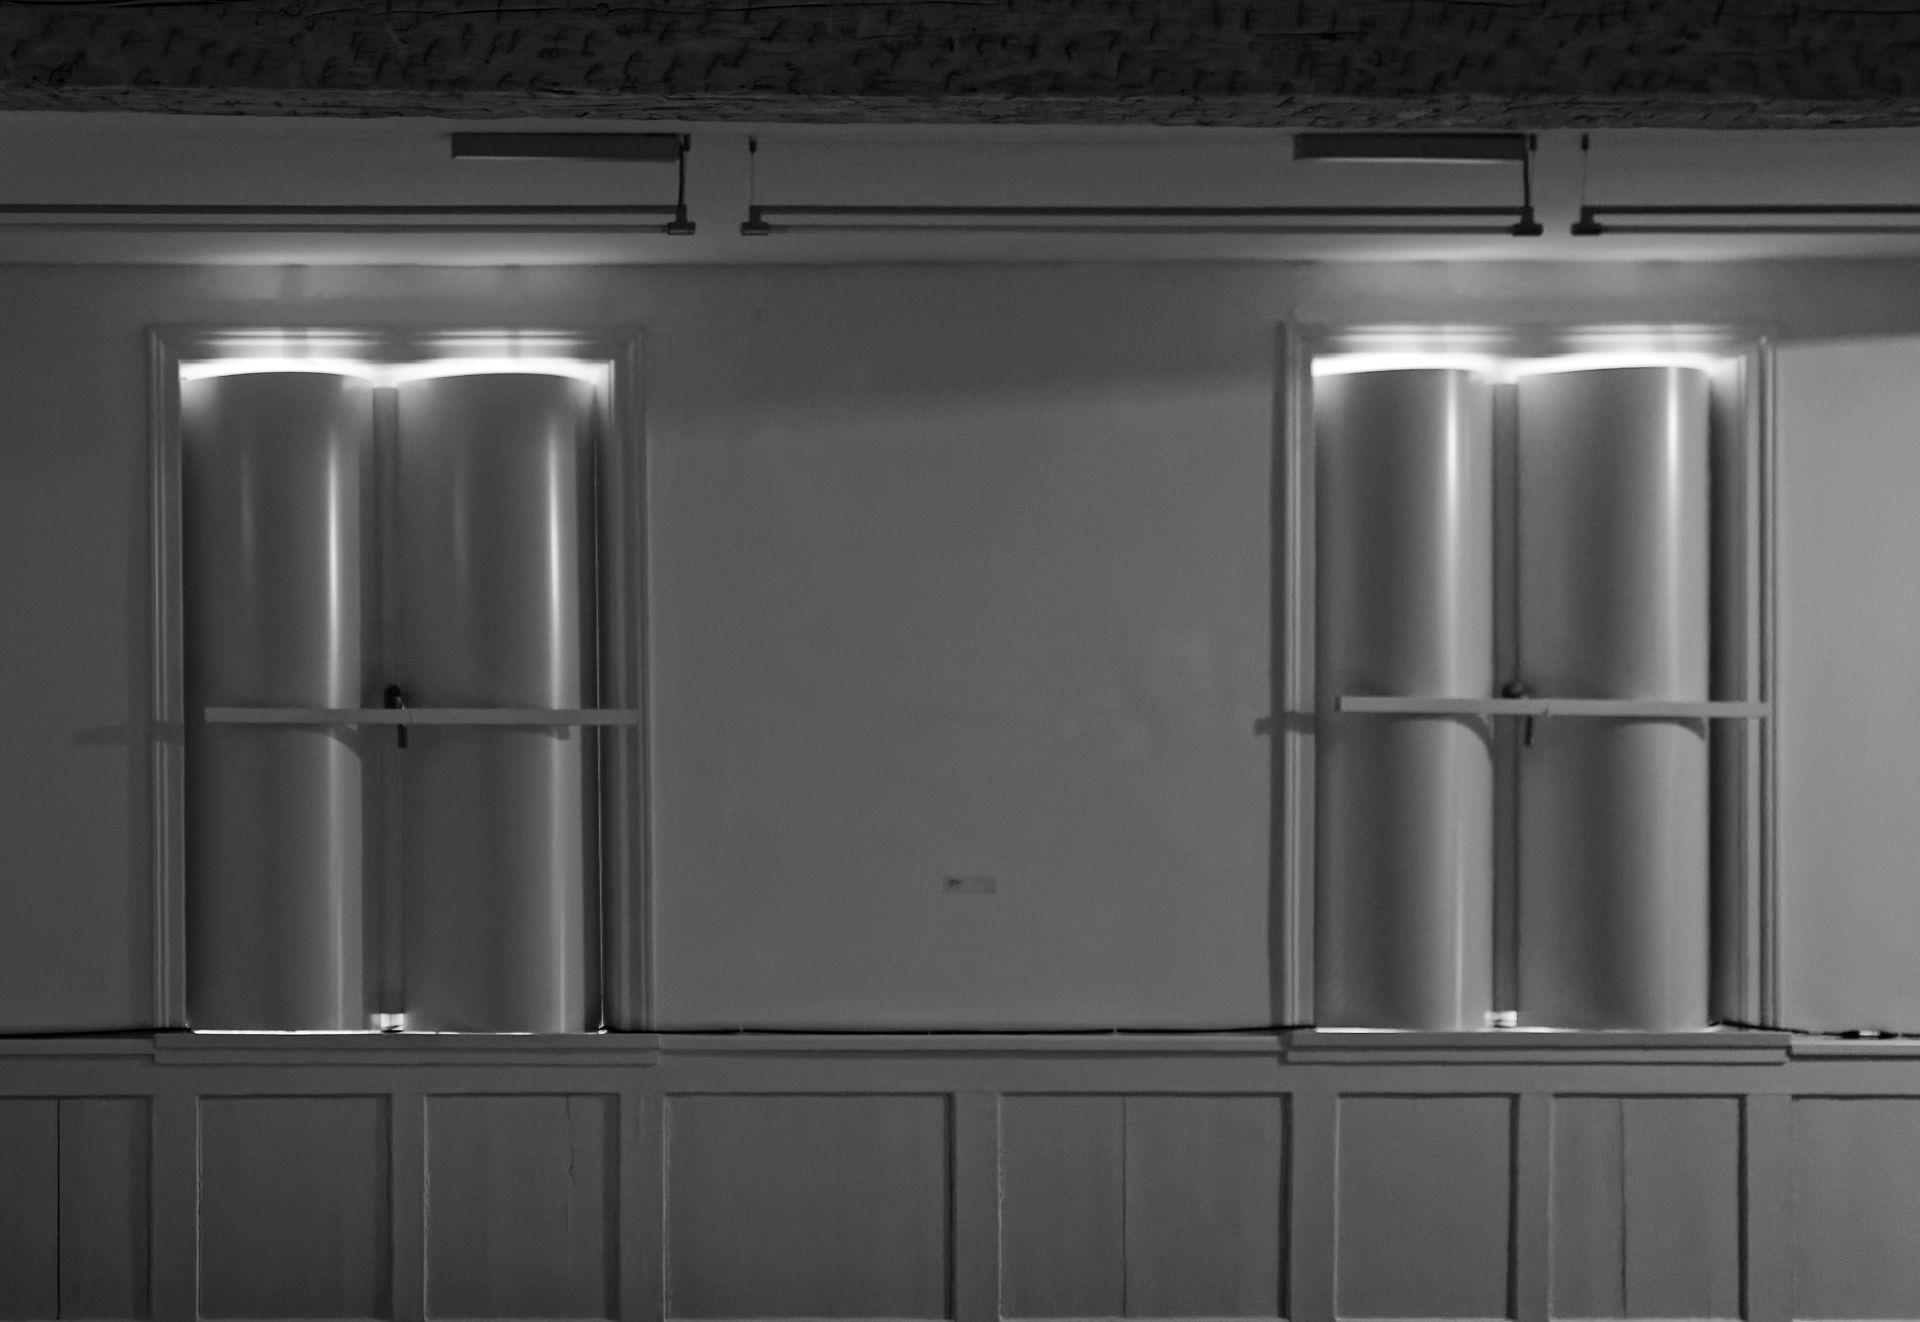 daniel_hausig_sprechende_wand_2009_light-art-installation